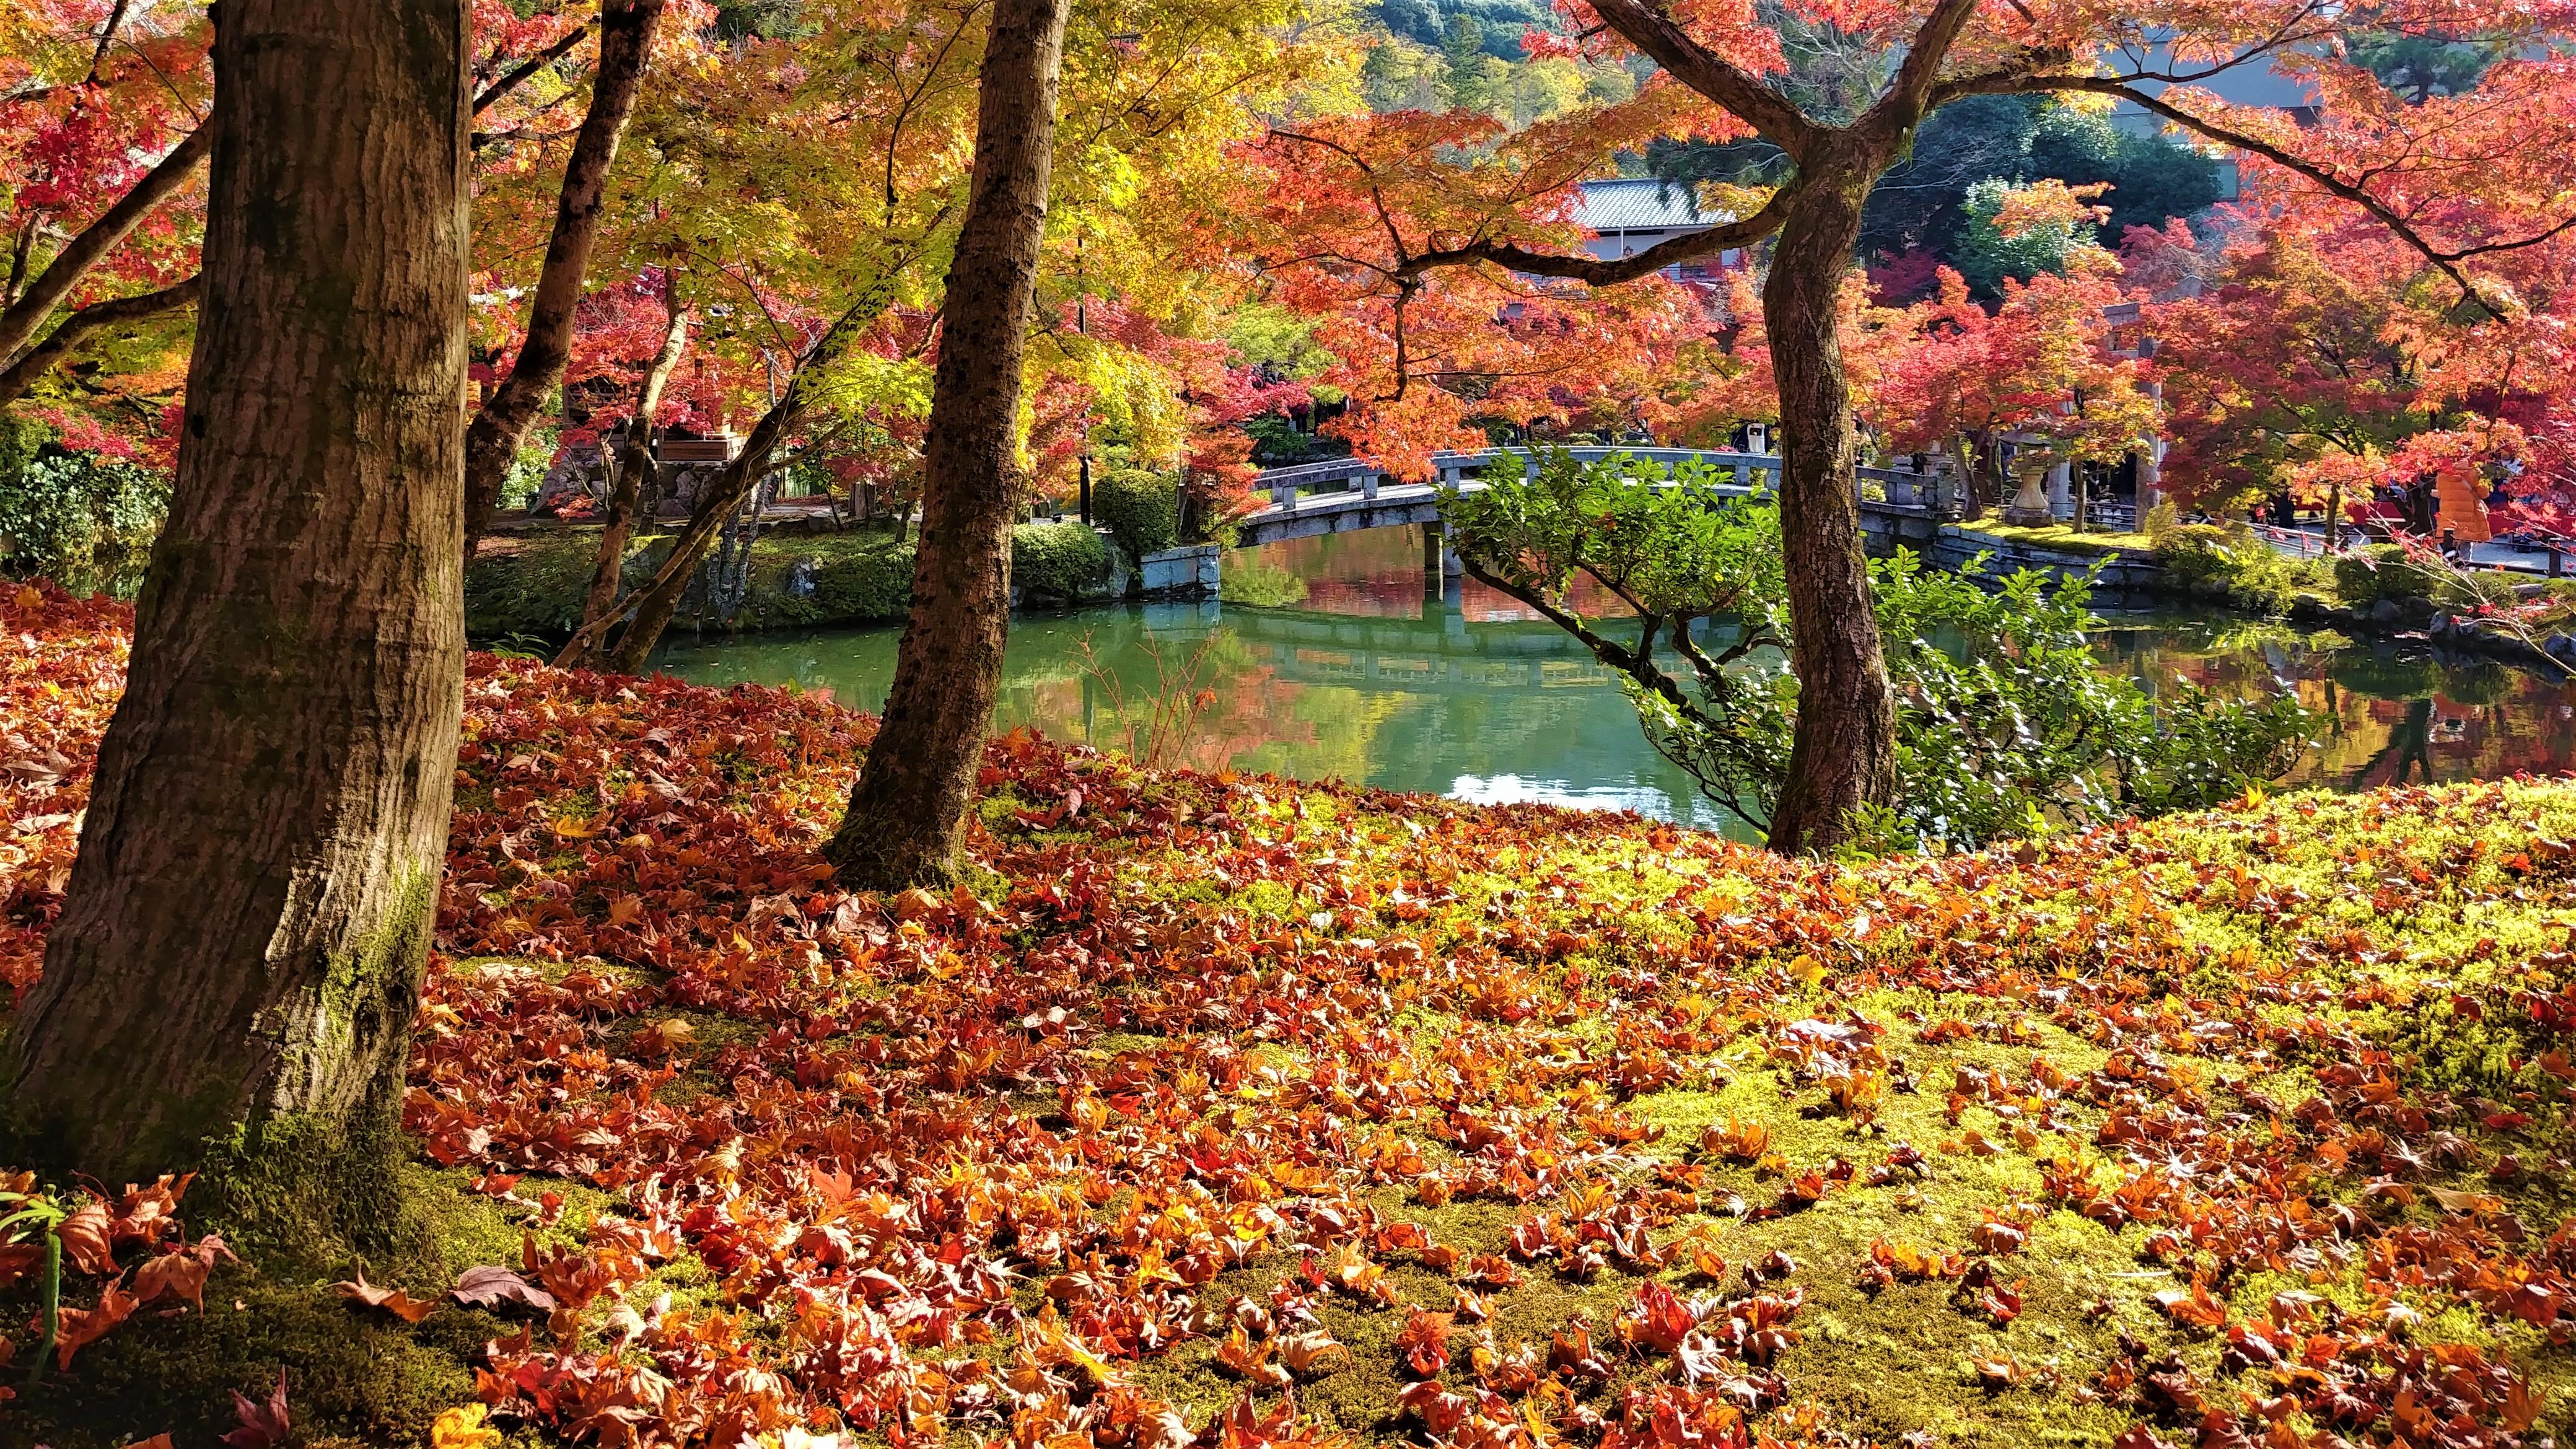 Kyoto temple Eikando automne Japon blog voyage asie arpenter le chemin